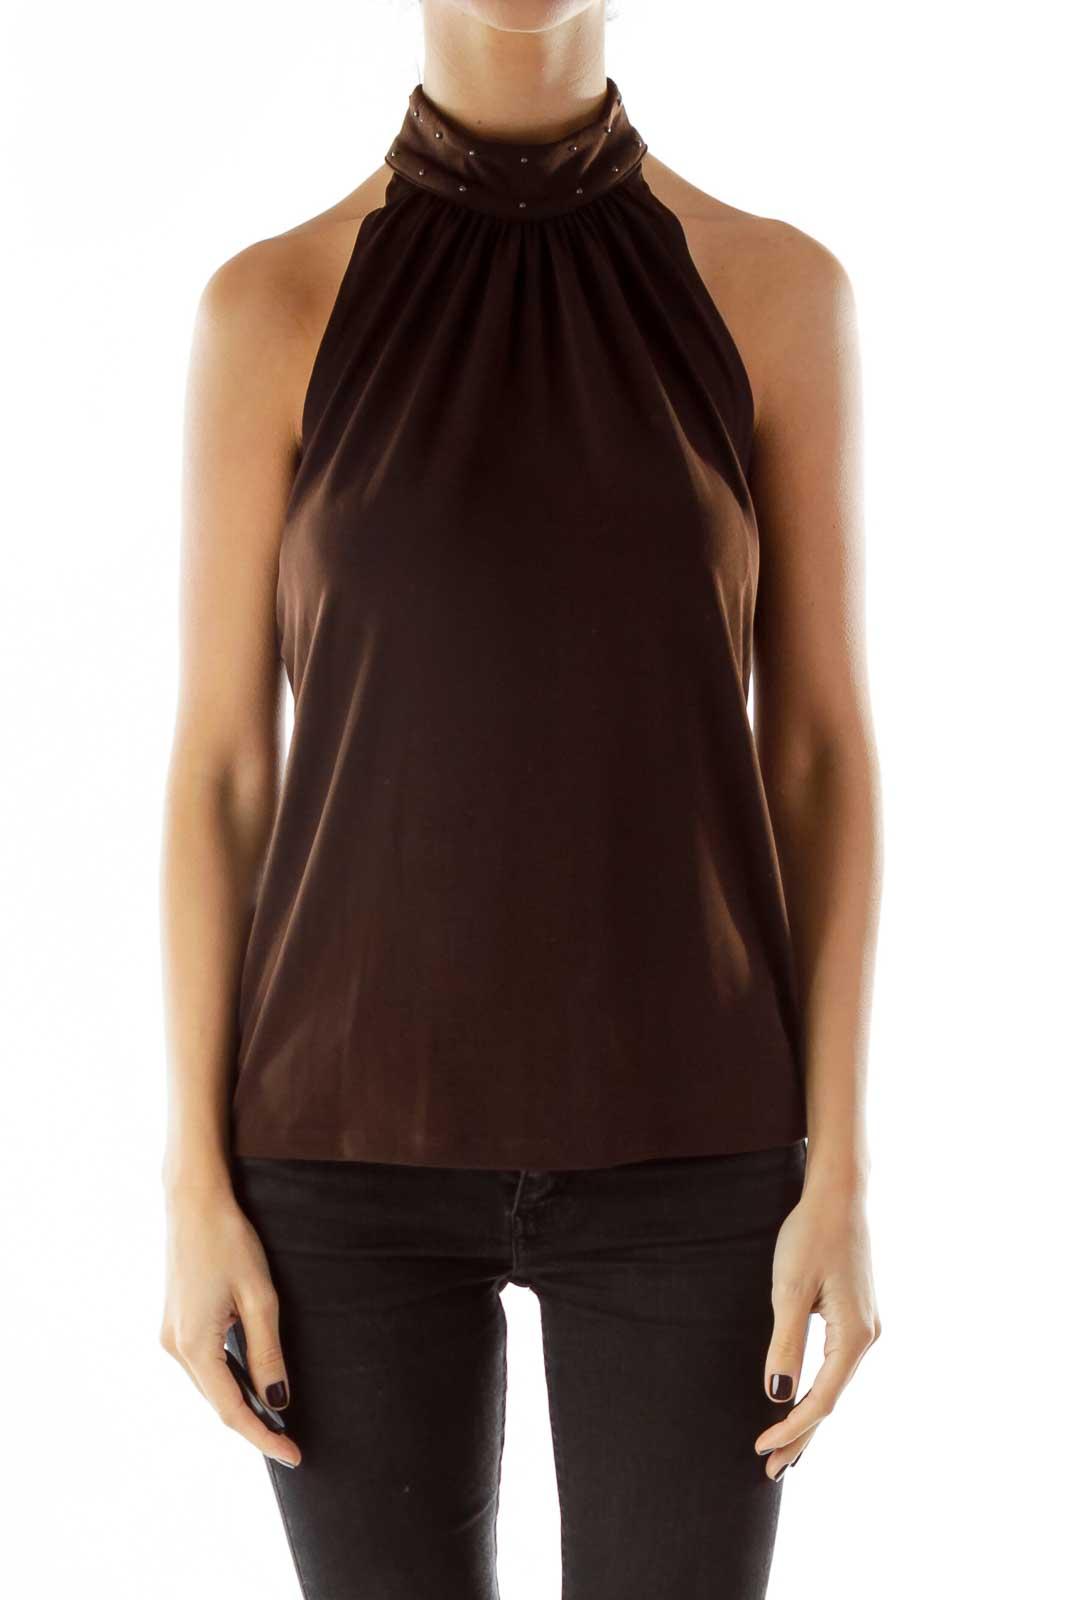 Brown Halter Studded Top